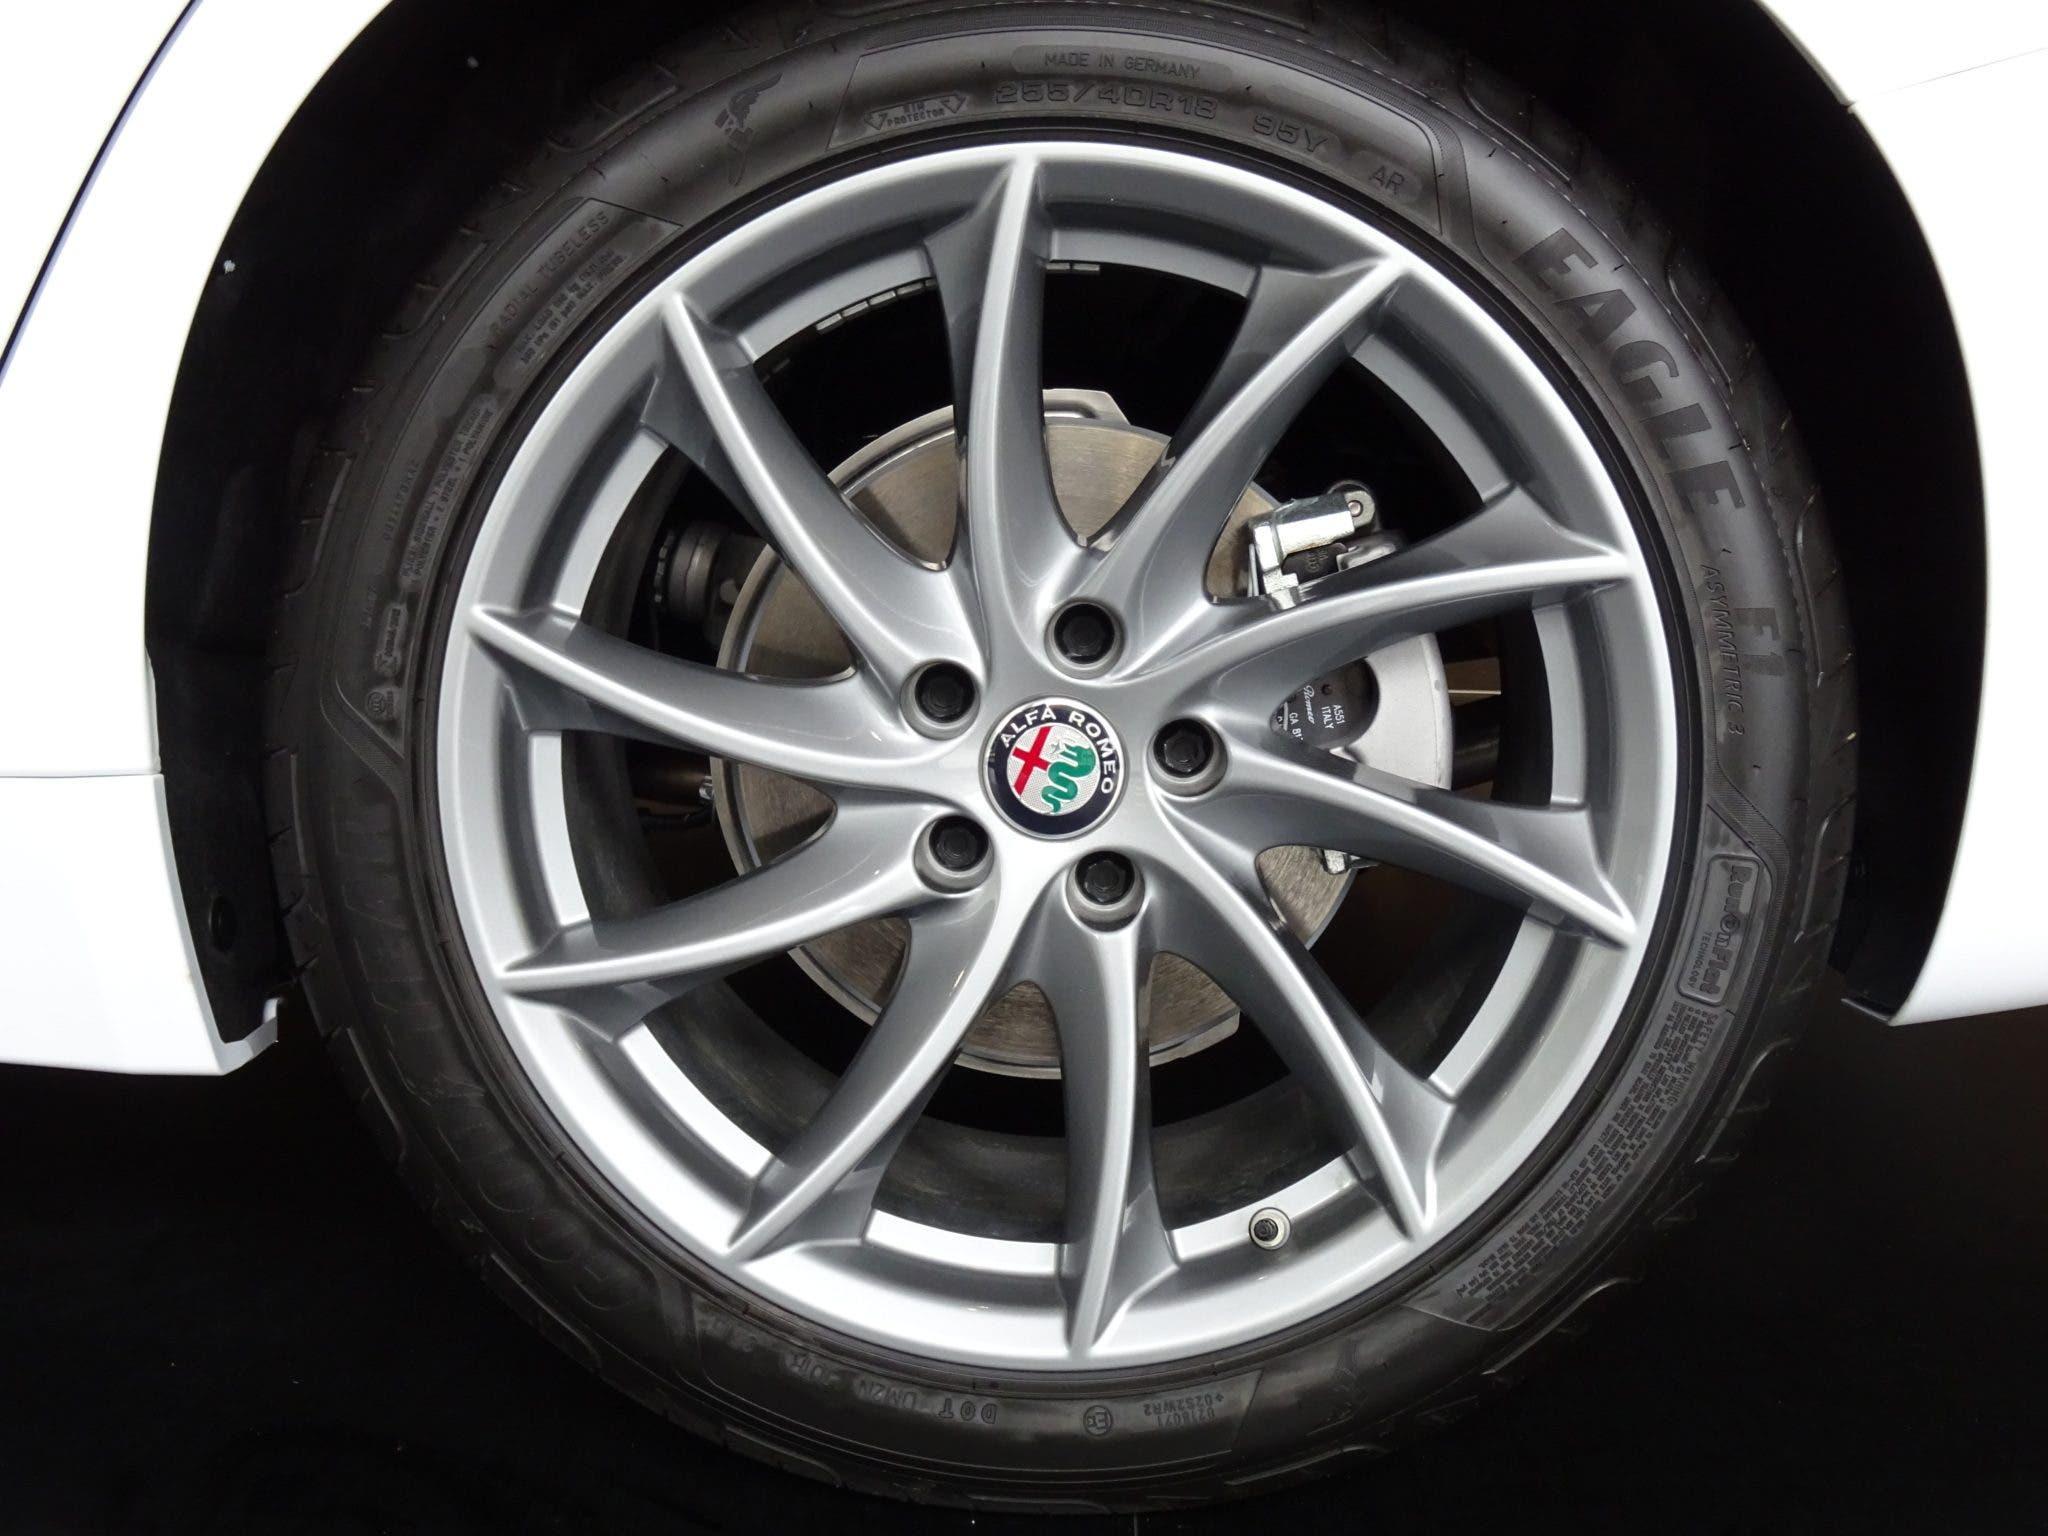 Club Alfa Romeo Giulia cerchi gomme